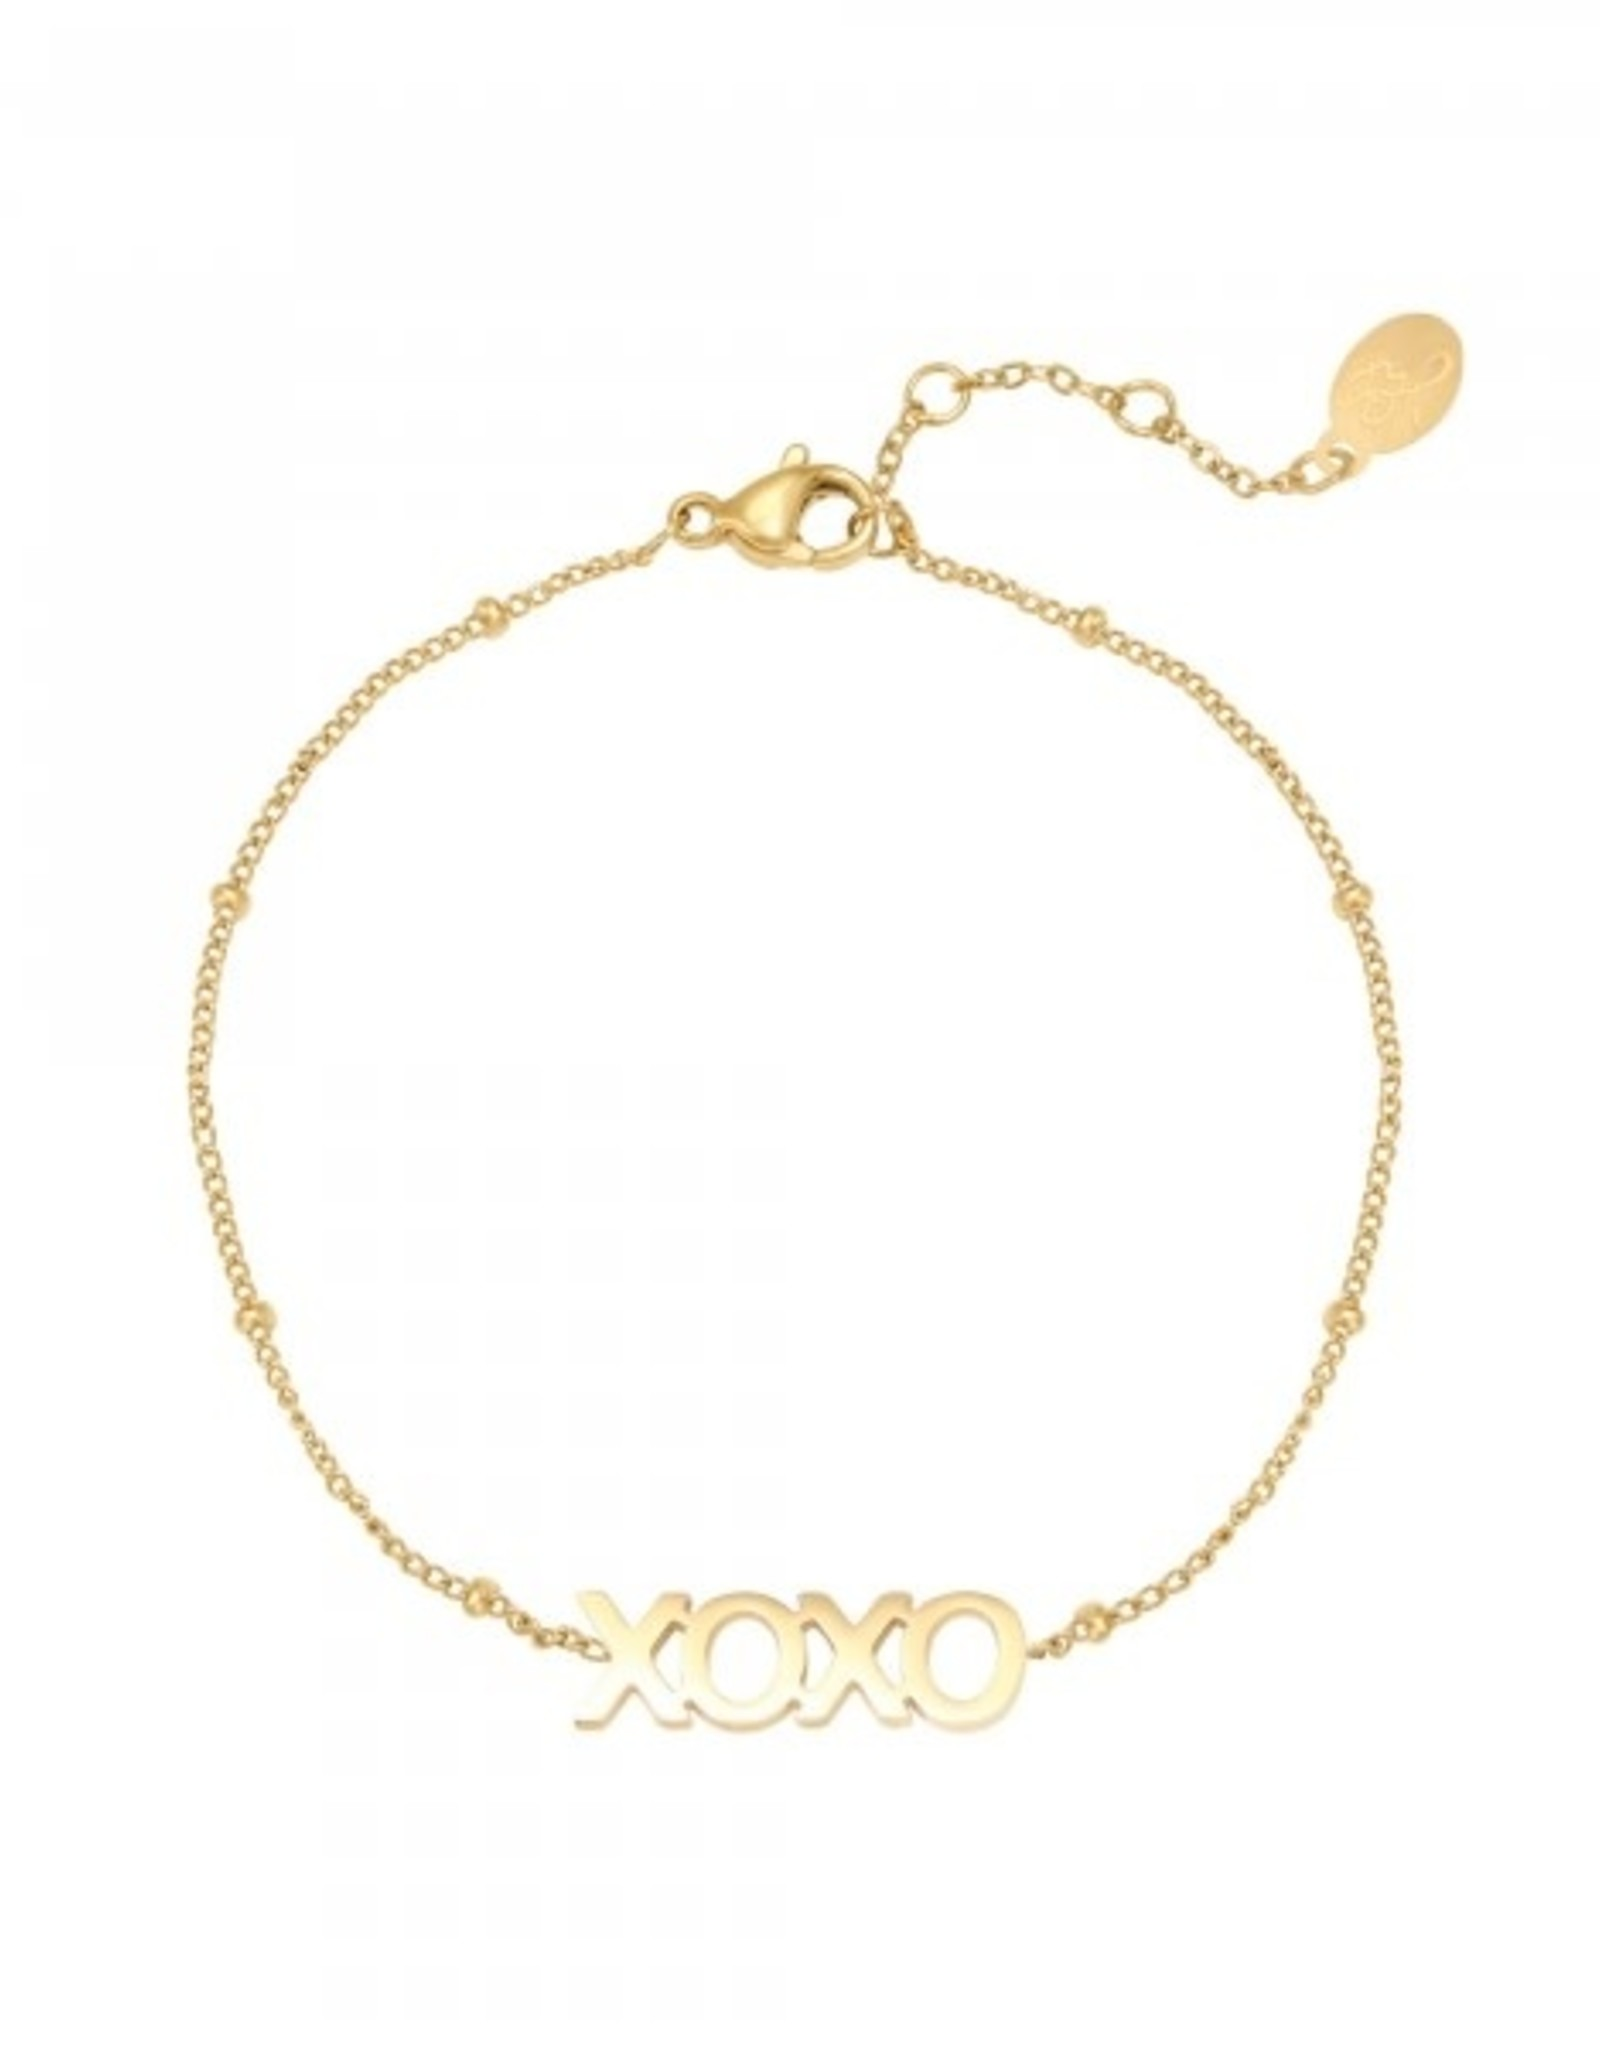 Bracelet XOXO gold